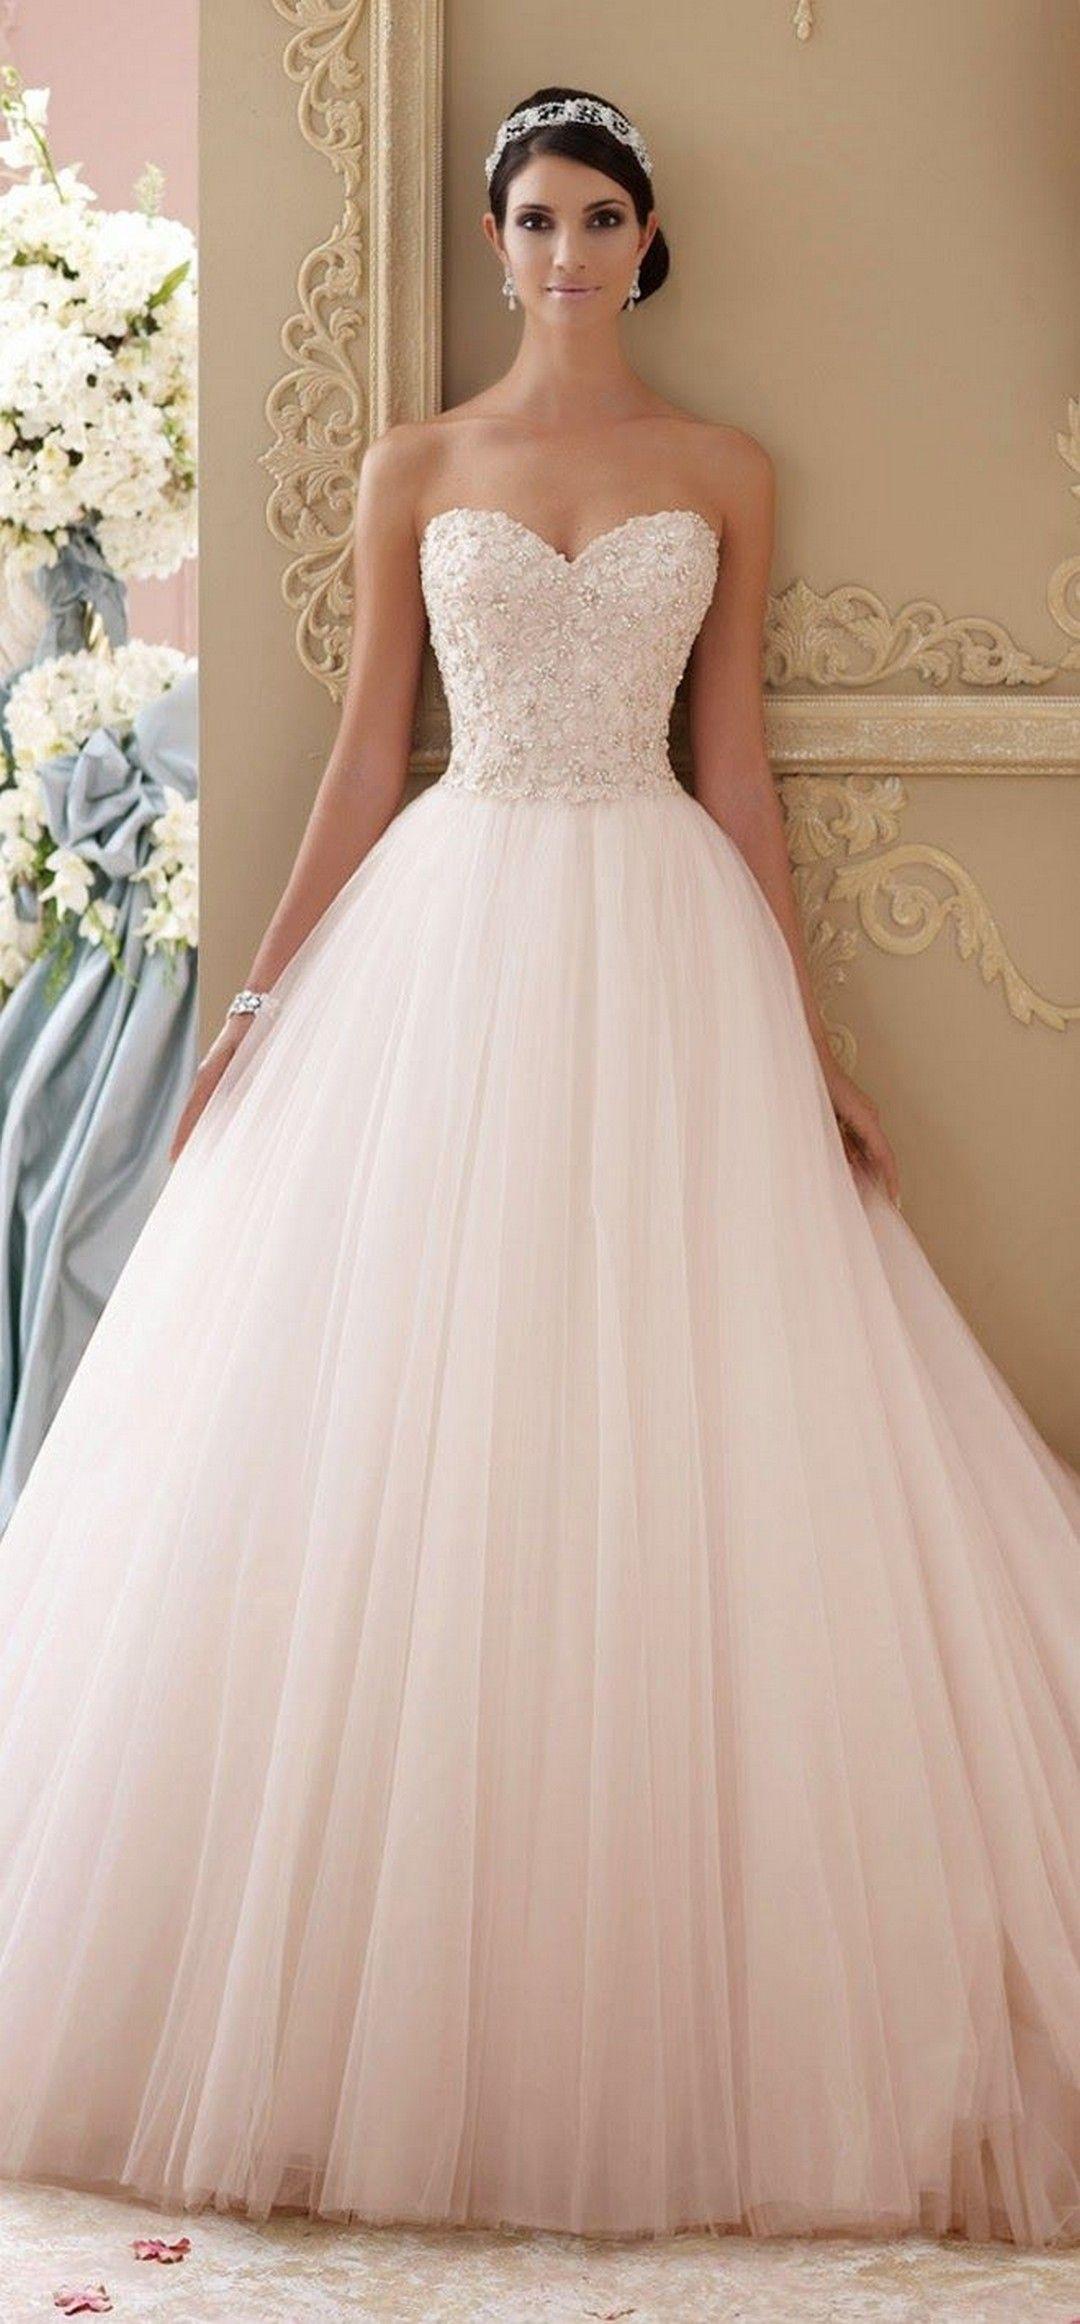 Graceful 90 Ideas For Princess Style Wedding Dresses Pink Wedding Dresses Best Wedding Dresses Beautiful Wedding Dresses [ 2324 x 1080 Pixel ]